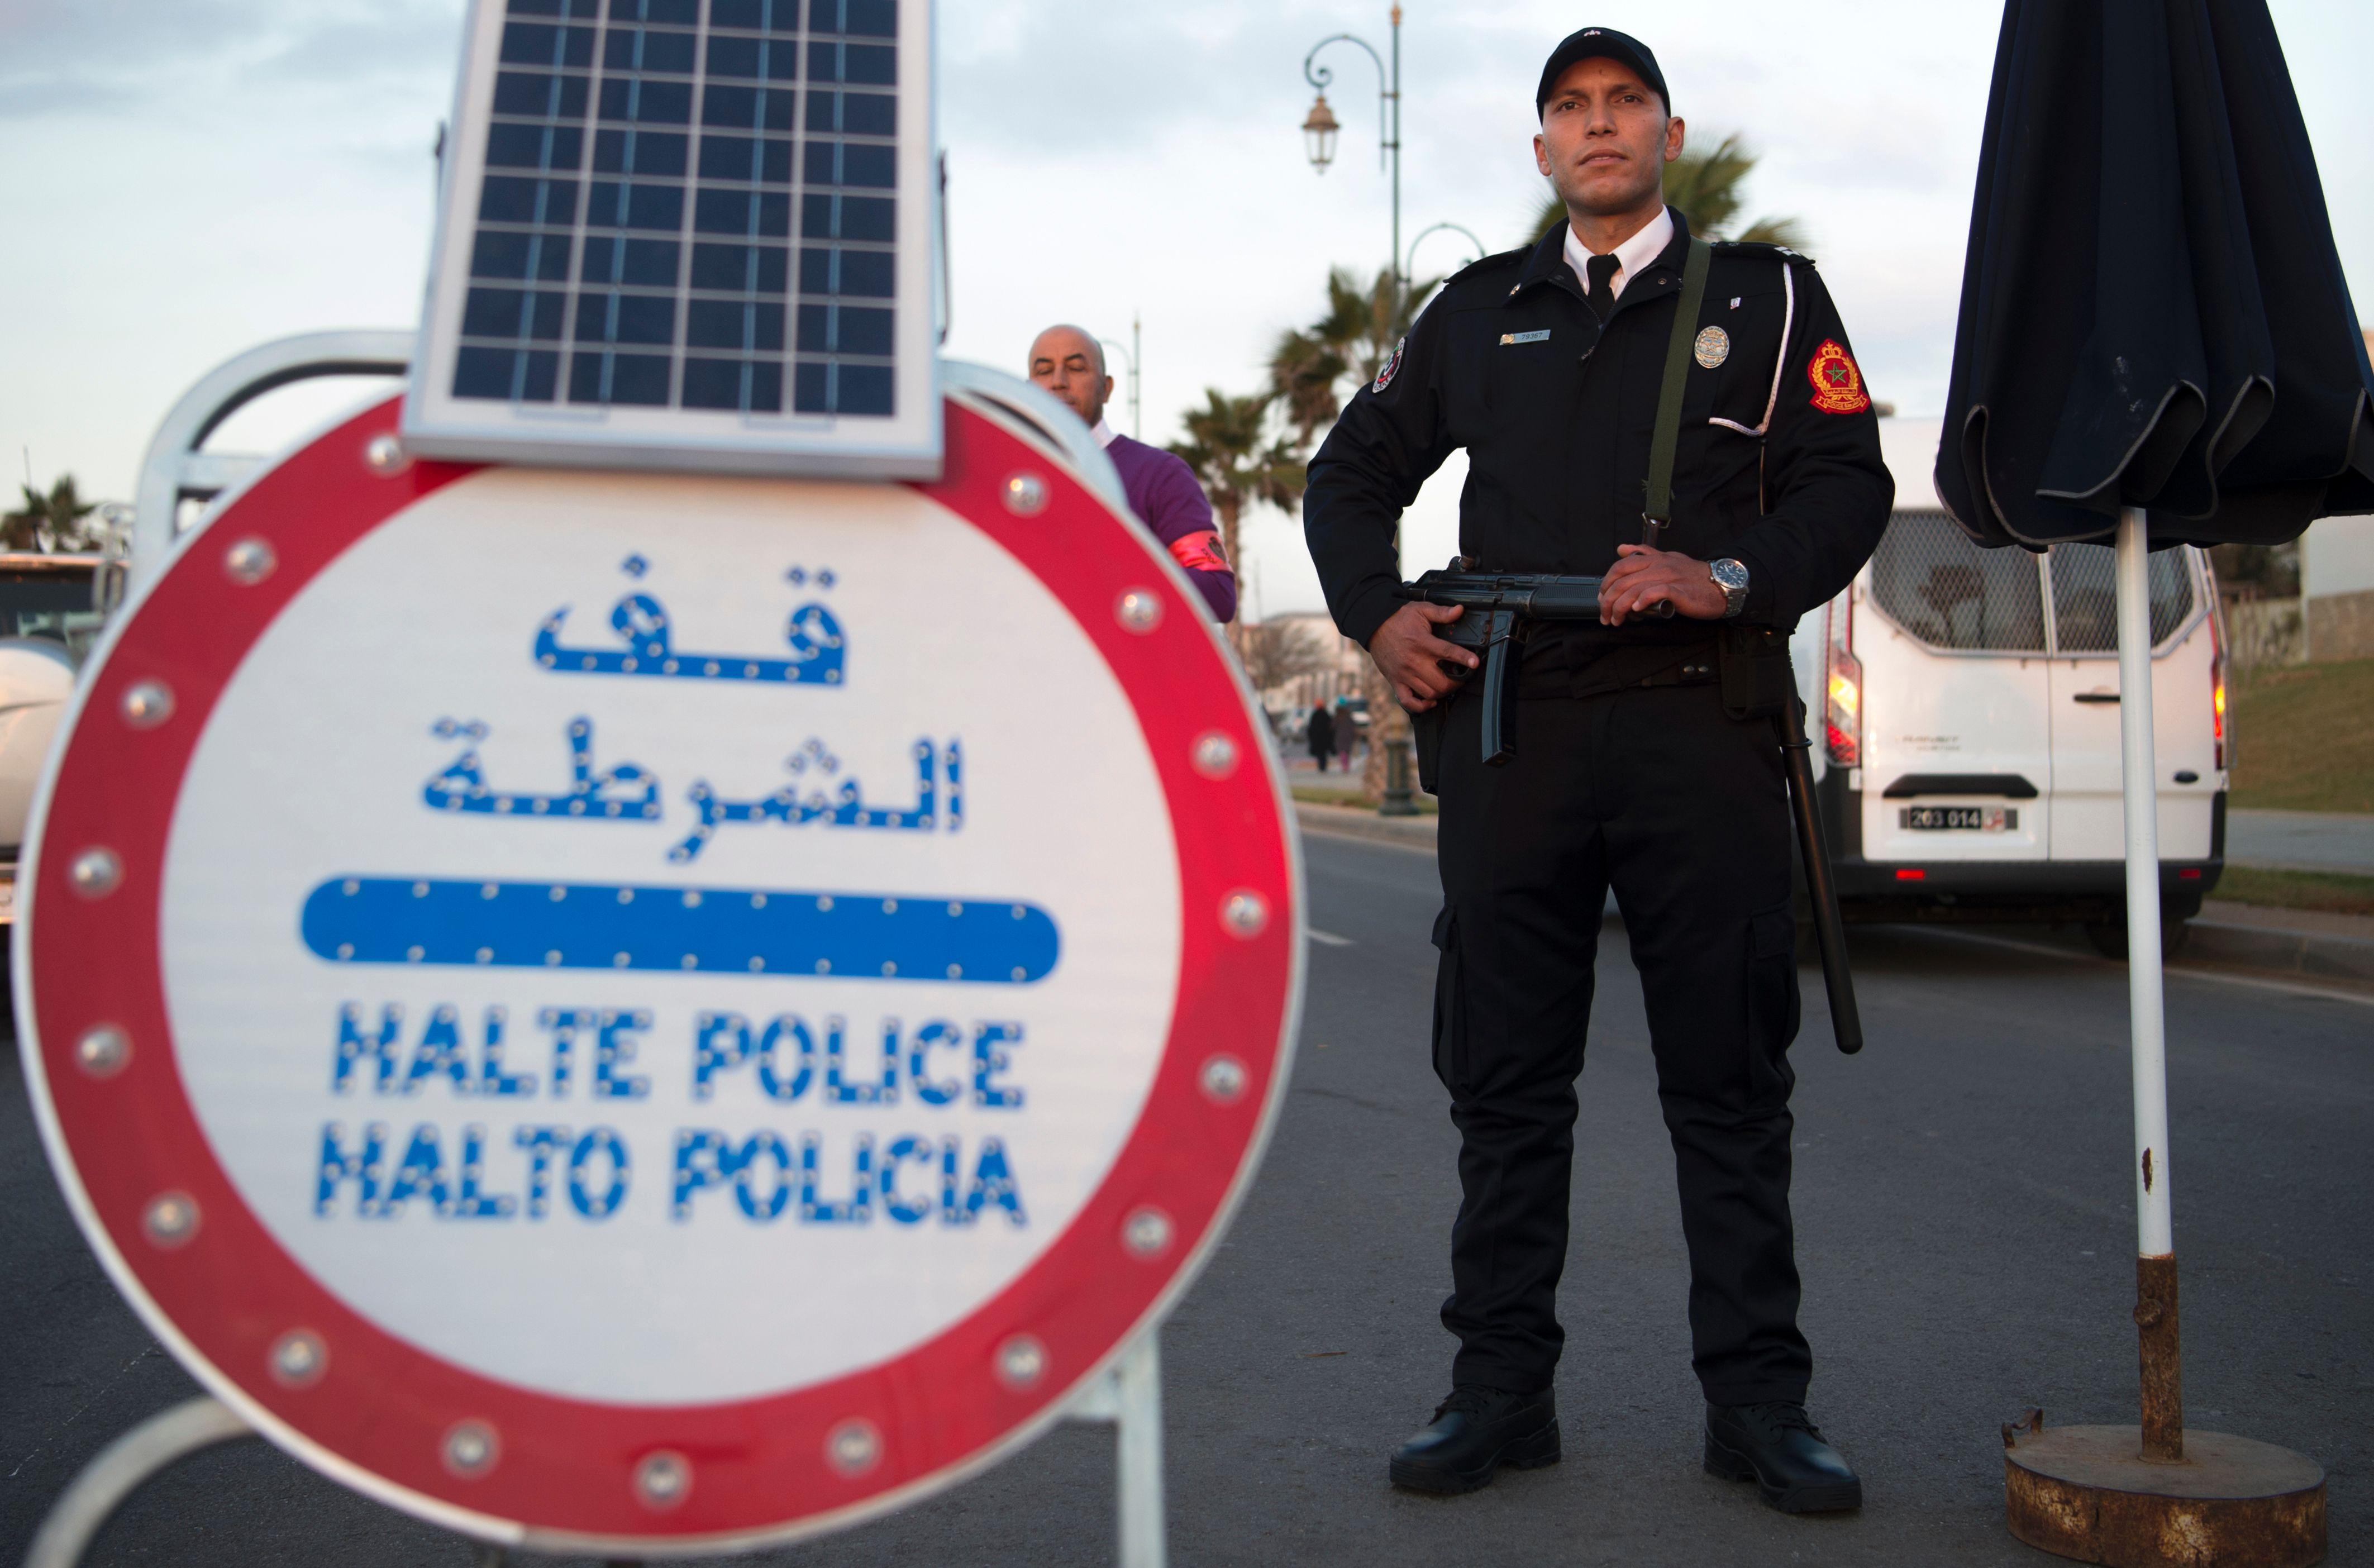 tout sur la police - Page 10 844770-شرطى-مغربى